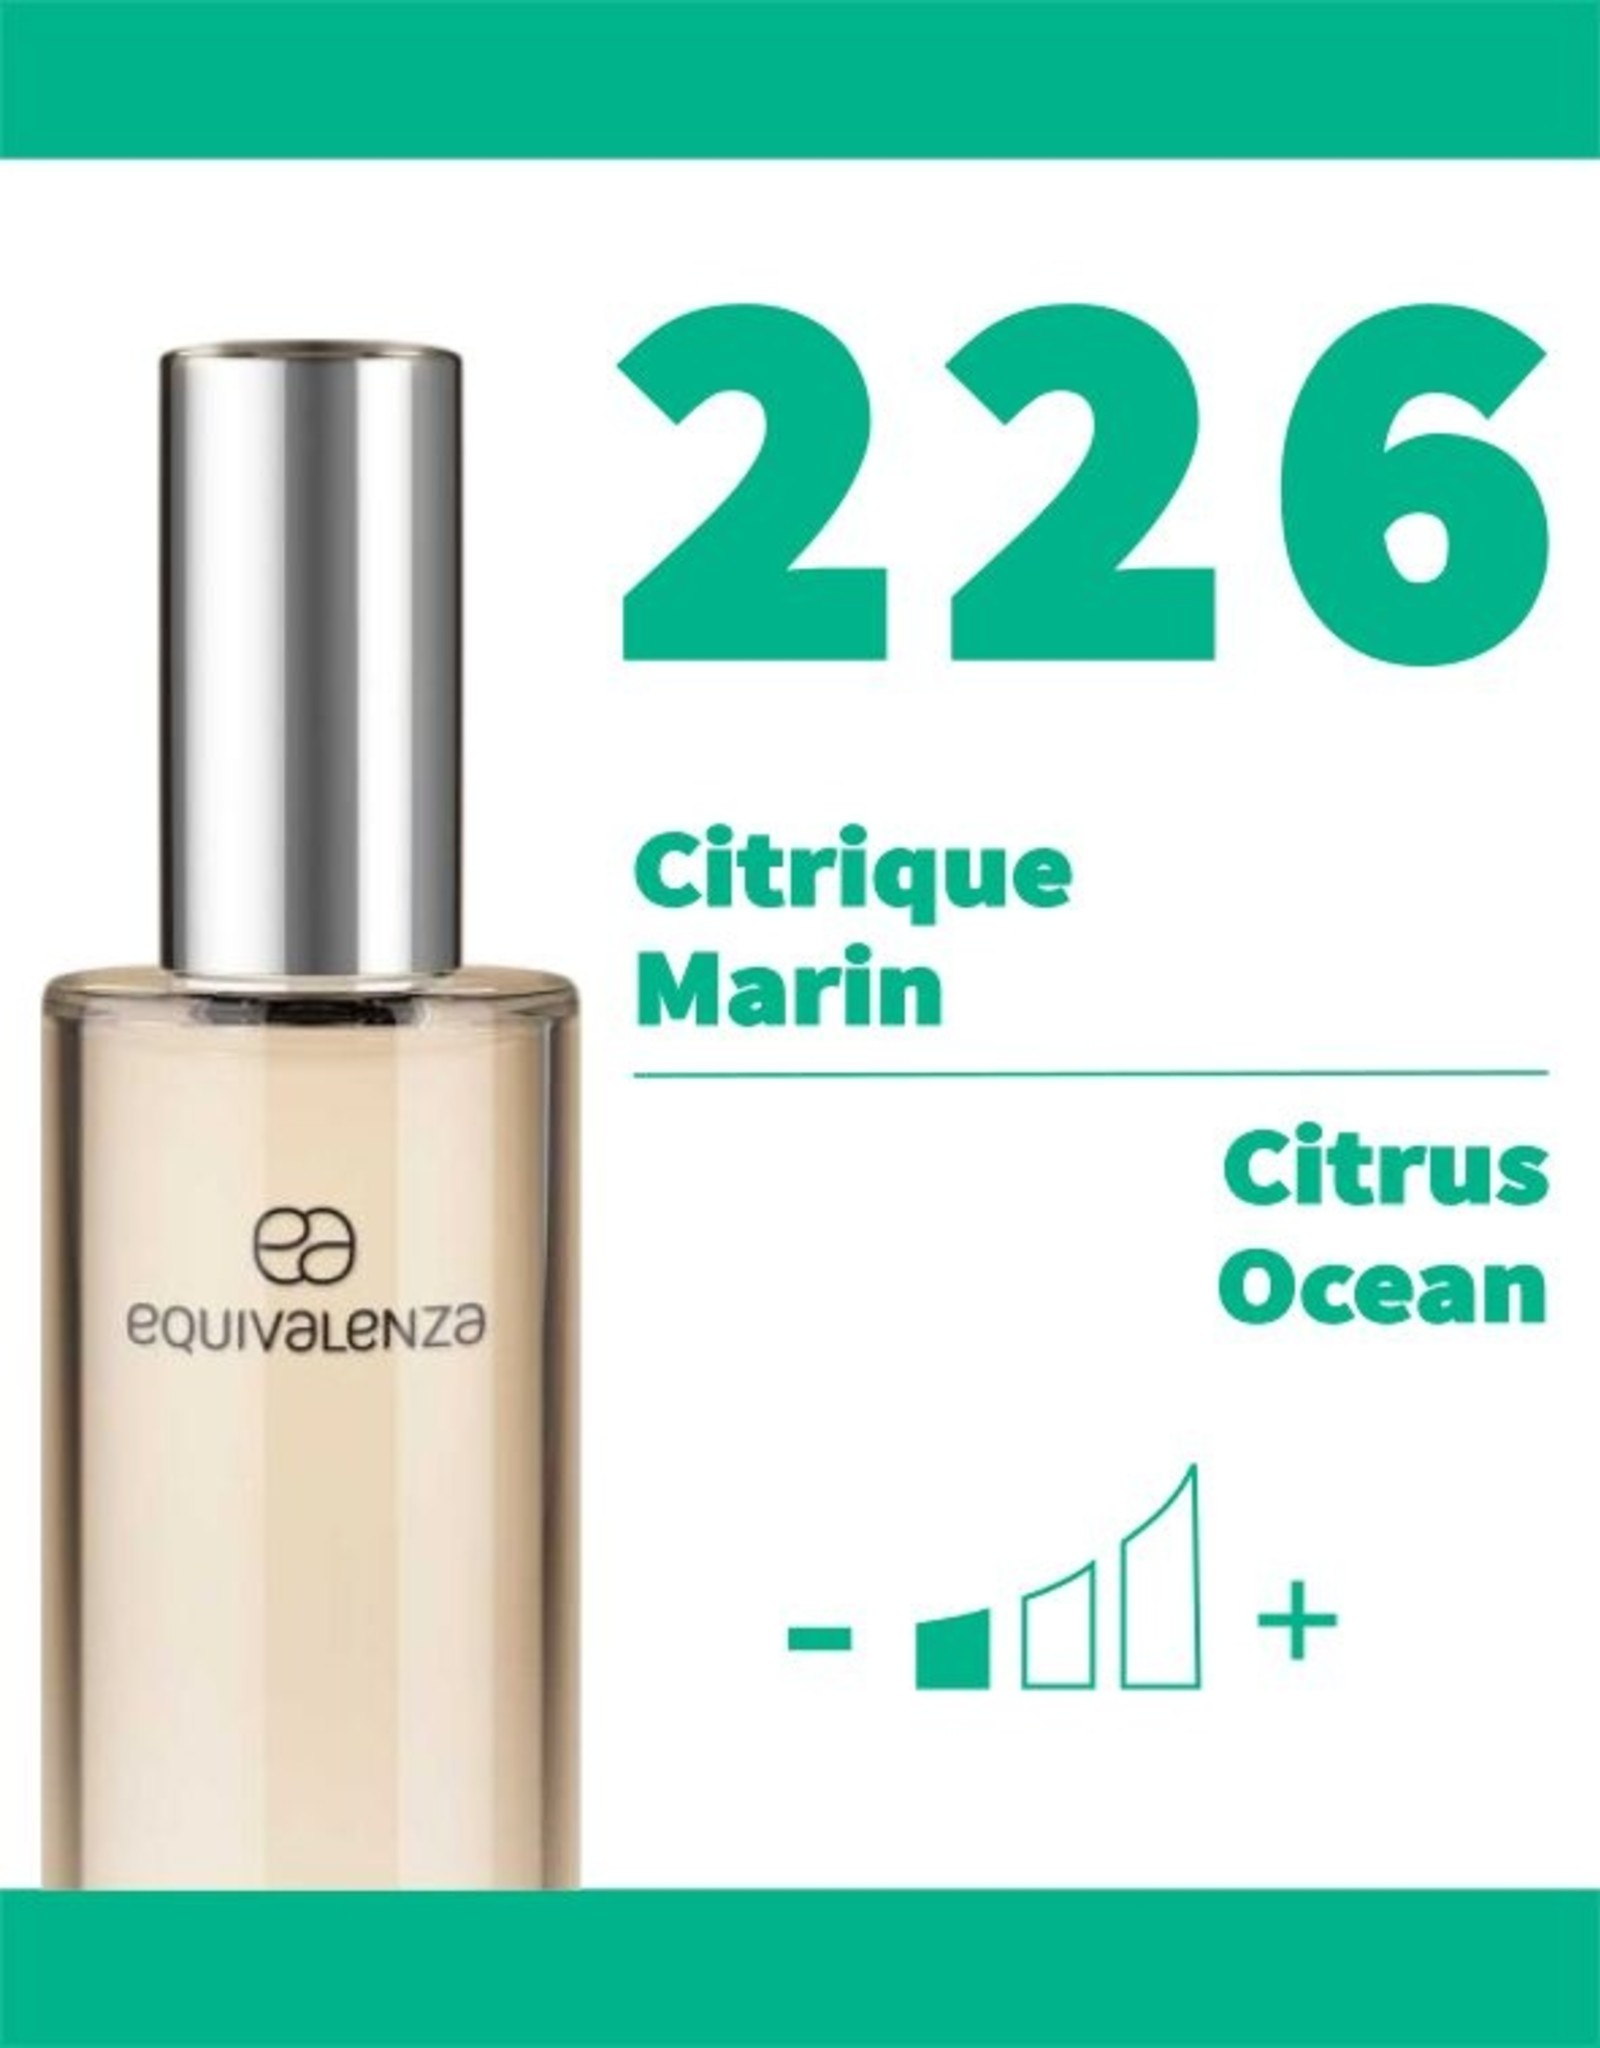 Equivalenza Citrus Ocean 226